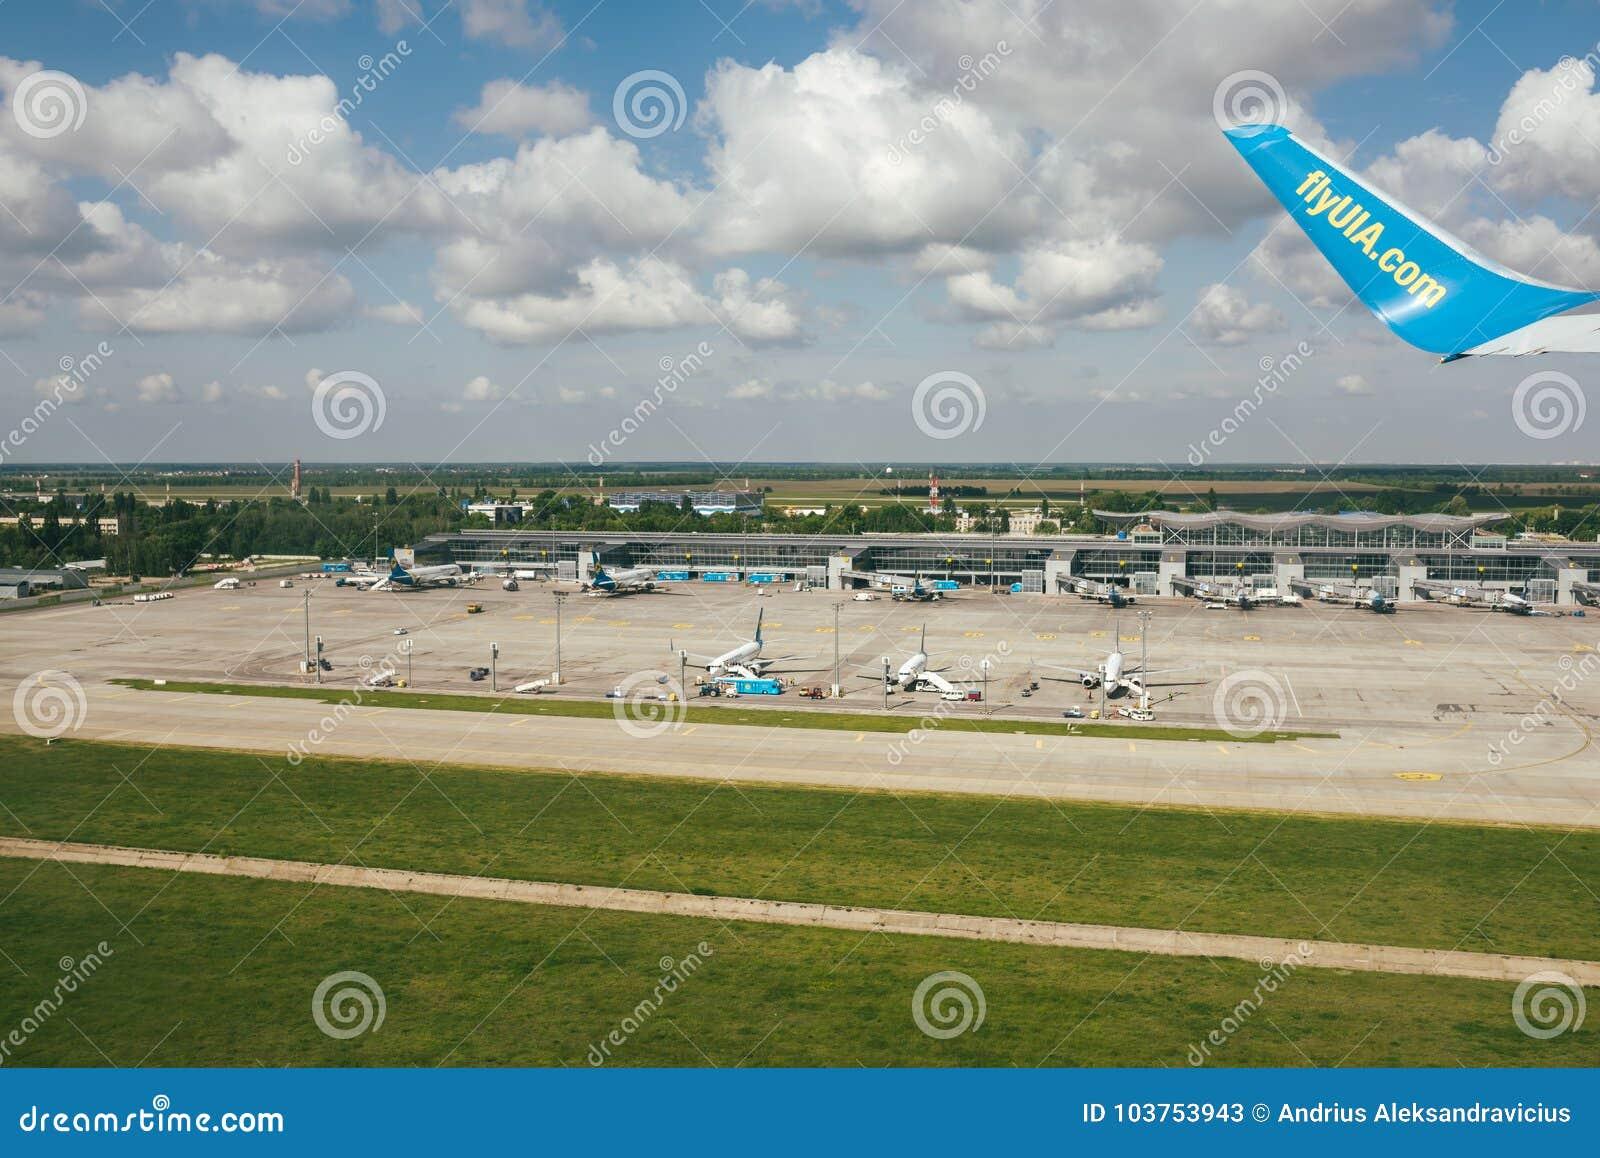 Aeroporto Kiev : Kiev boryspil airport editorial stock photo image of landing